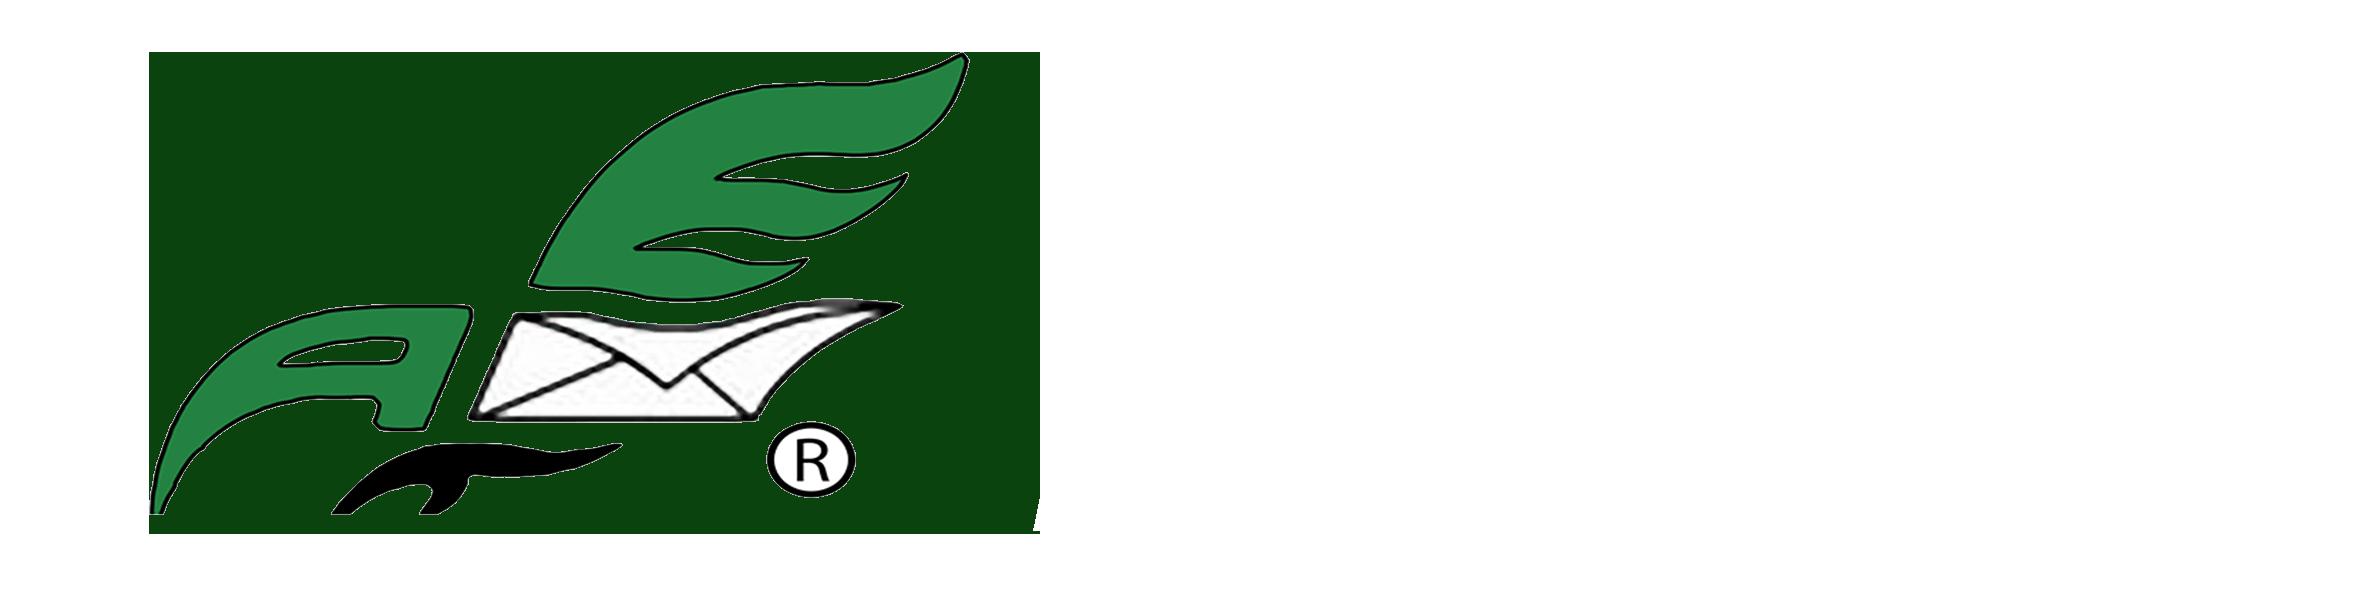 Agenzia Espressi